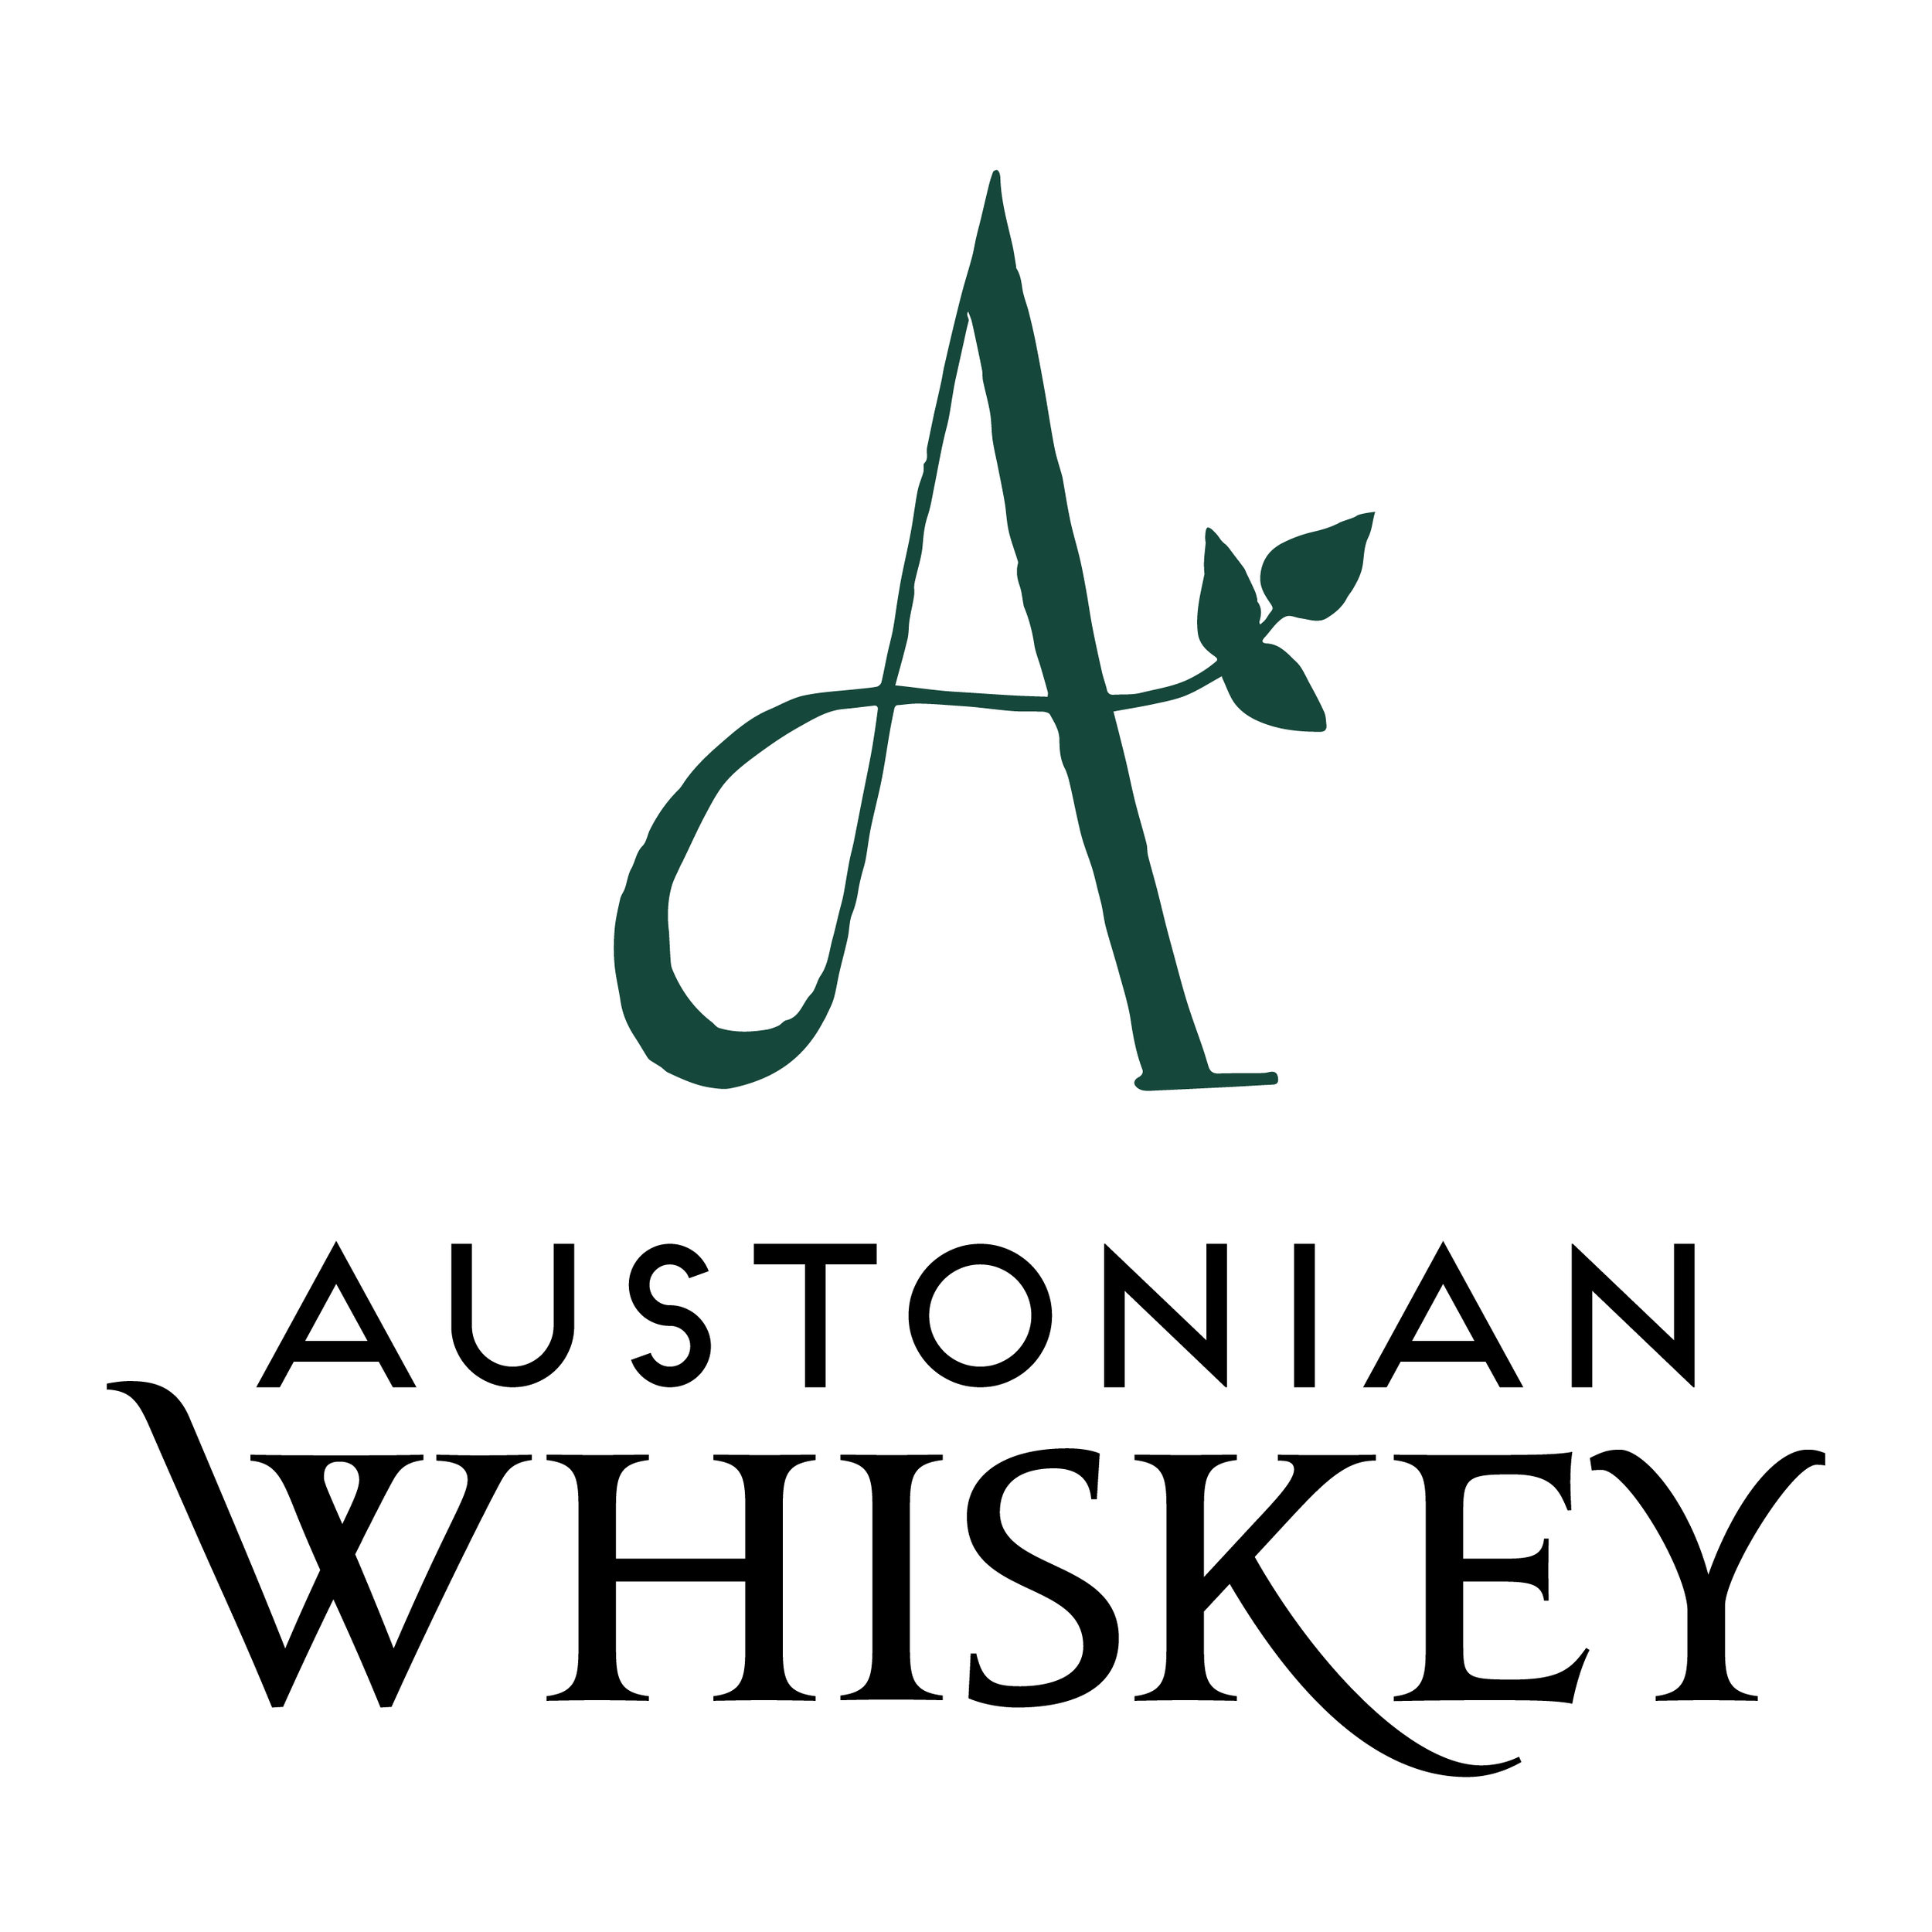 AustonianWhiskey-AFI.jpg